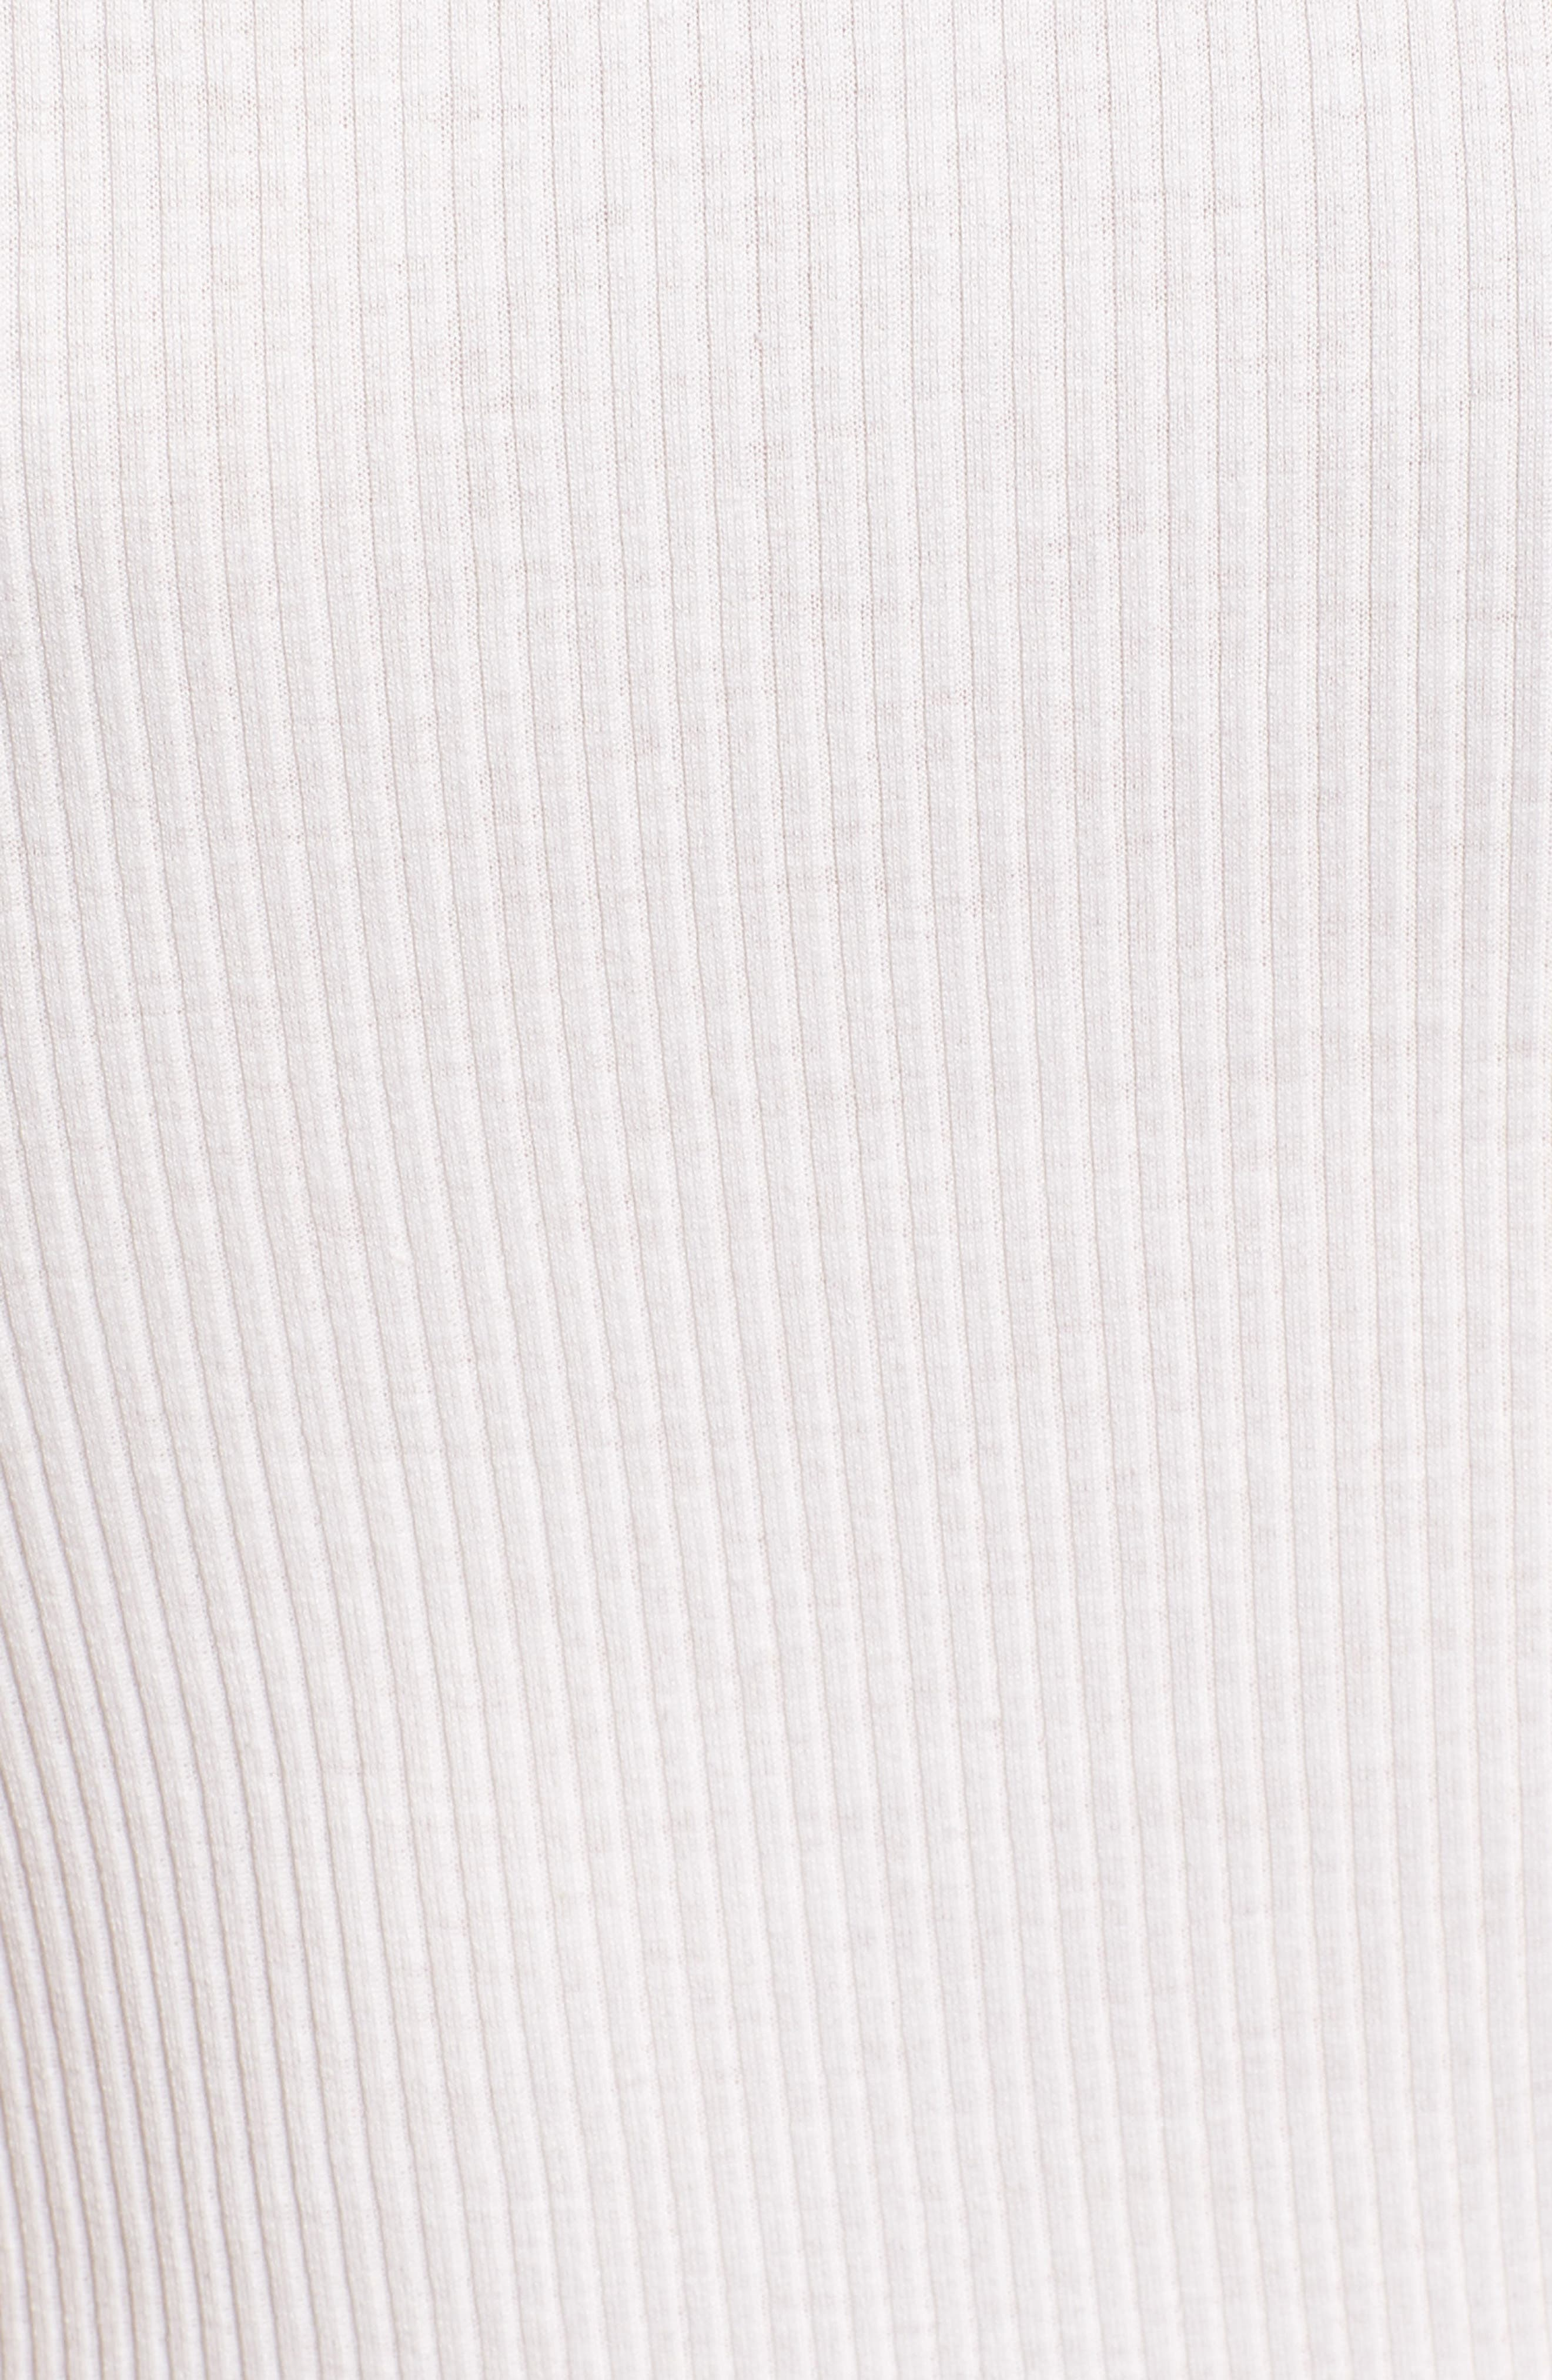 ROSEMUNDE, Babette Lace Trim Tank, Alternate thumbnail 5, color, NEW WHITE